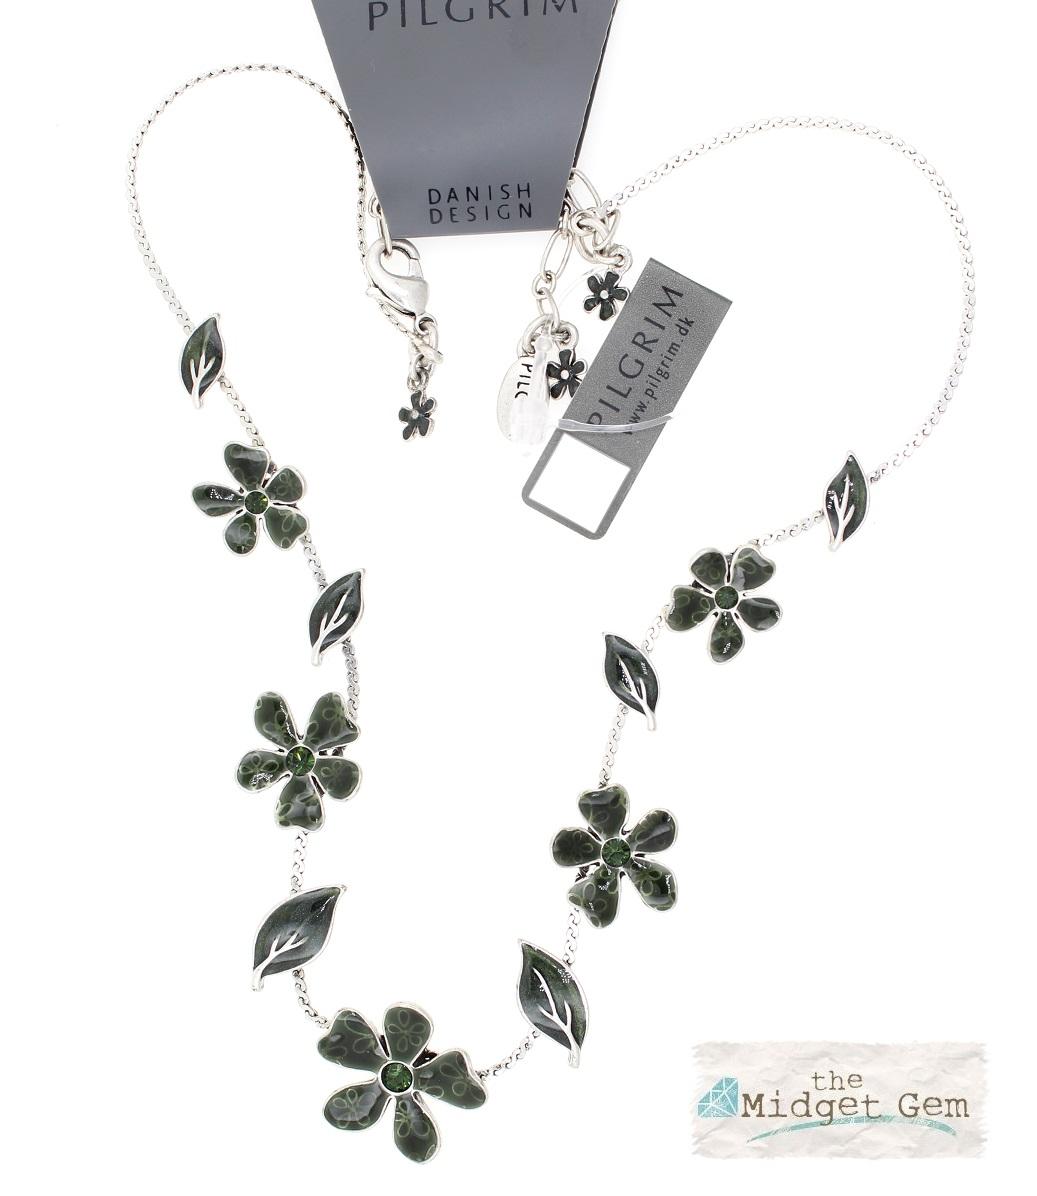 PILGRIM - Blossom - Single Strand Necklace - Silver/Teal Green BNWT